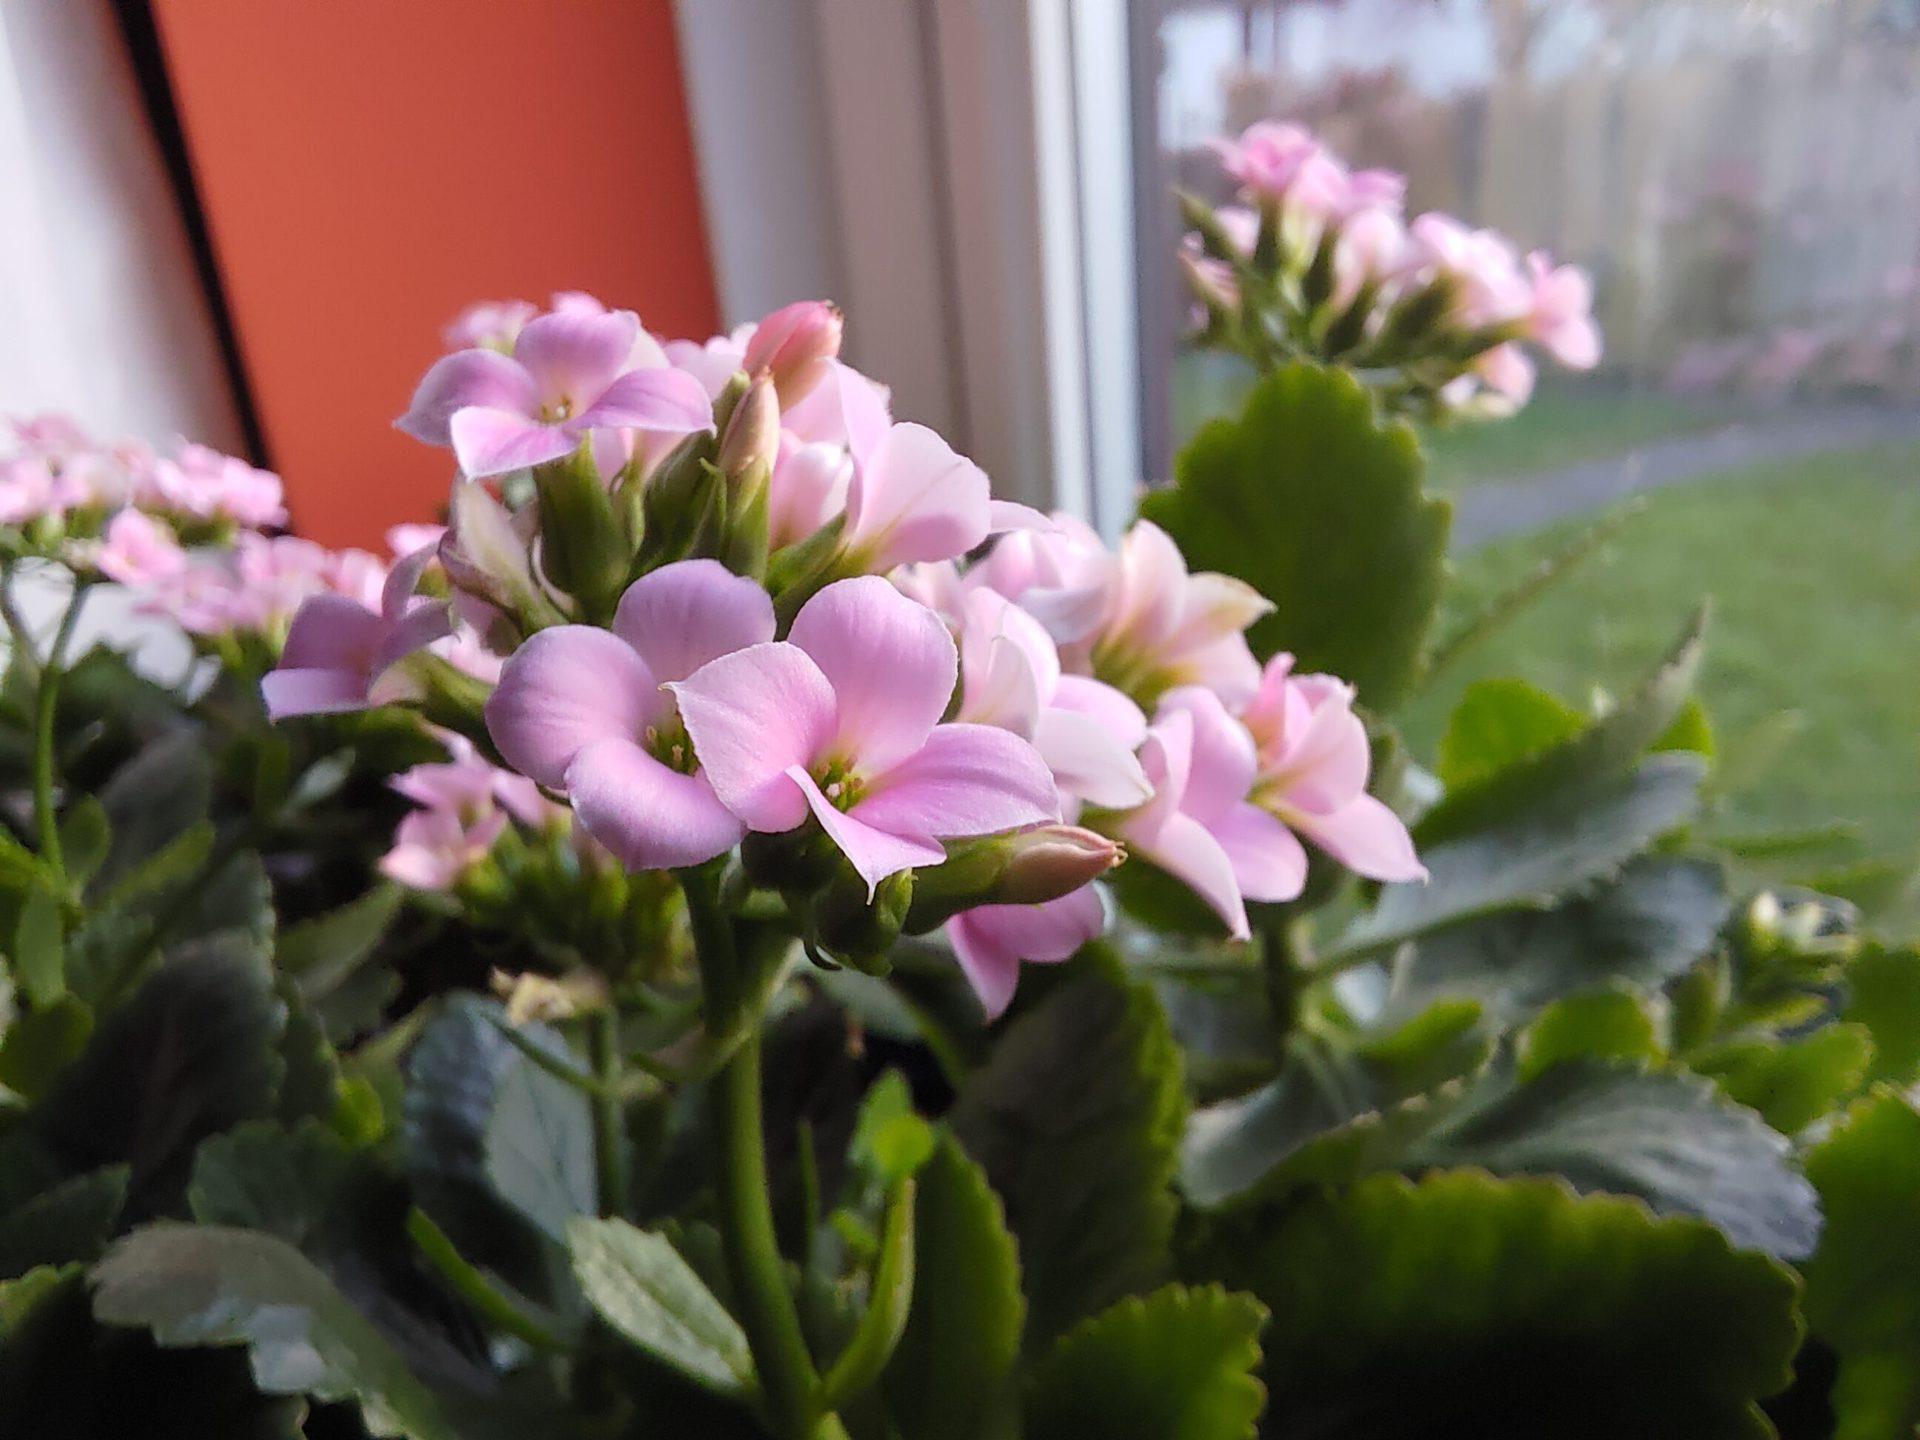 ROG Phone 5 macro camera sample of a pink flower